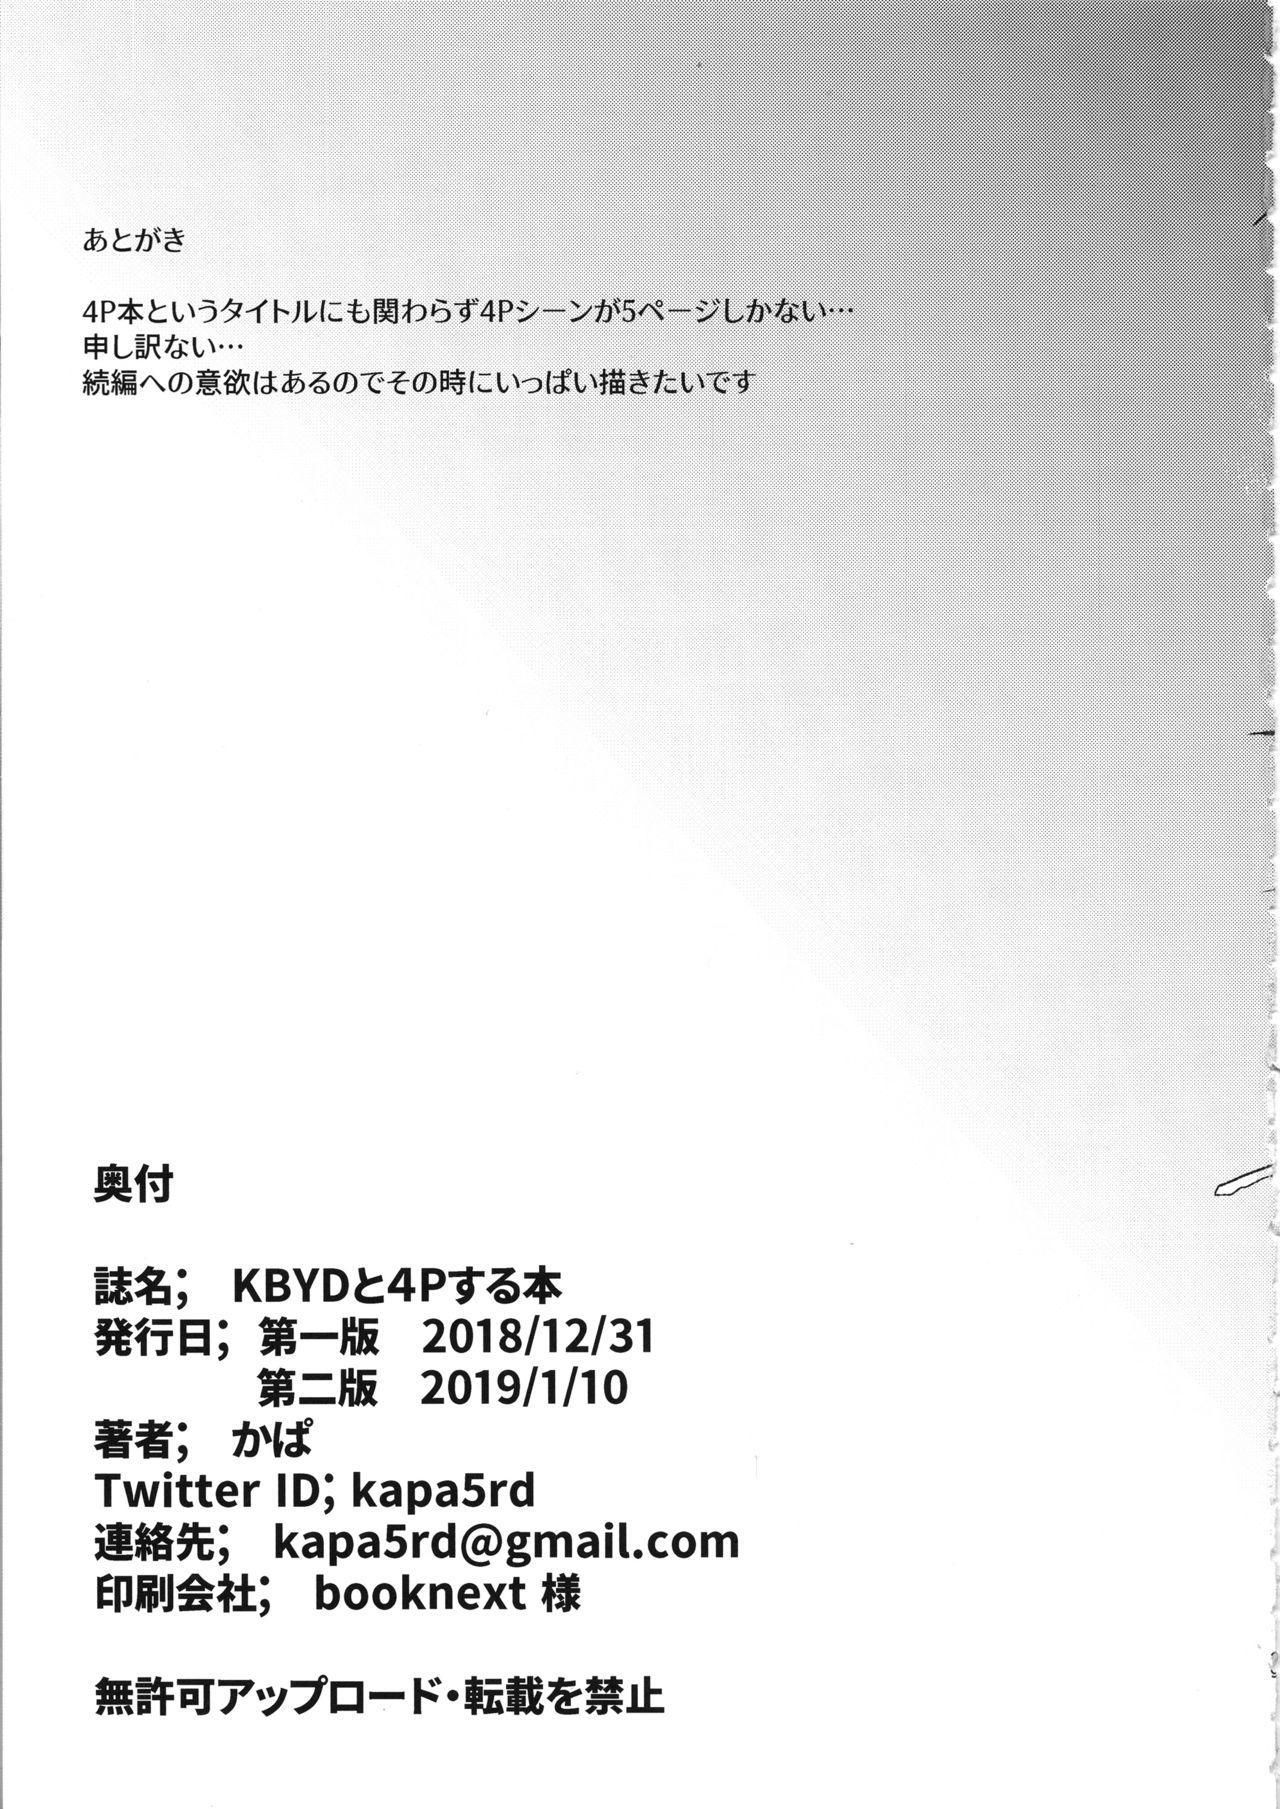 KBYD to 4P Suru Hon 27